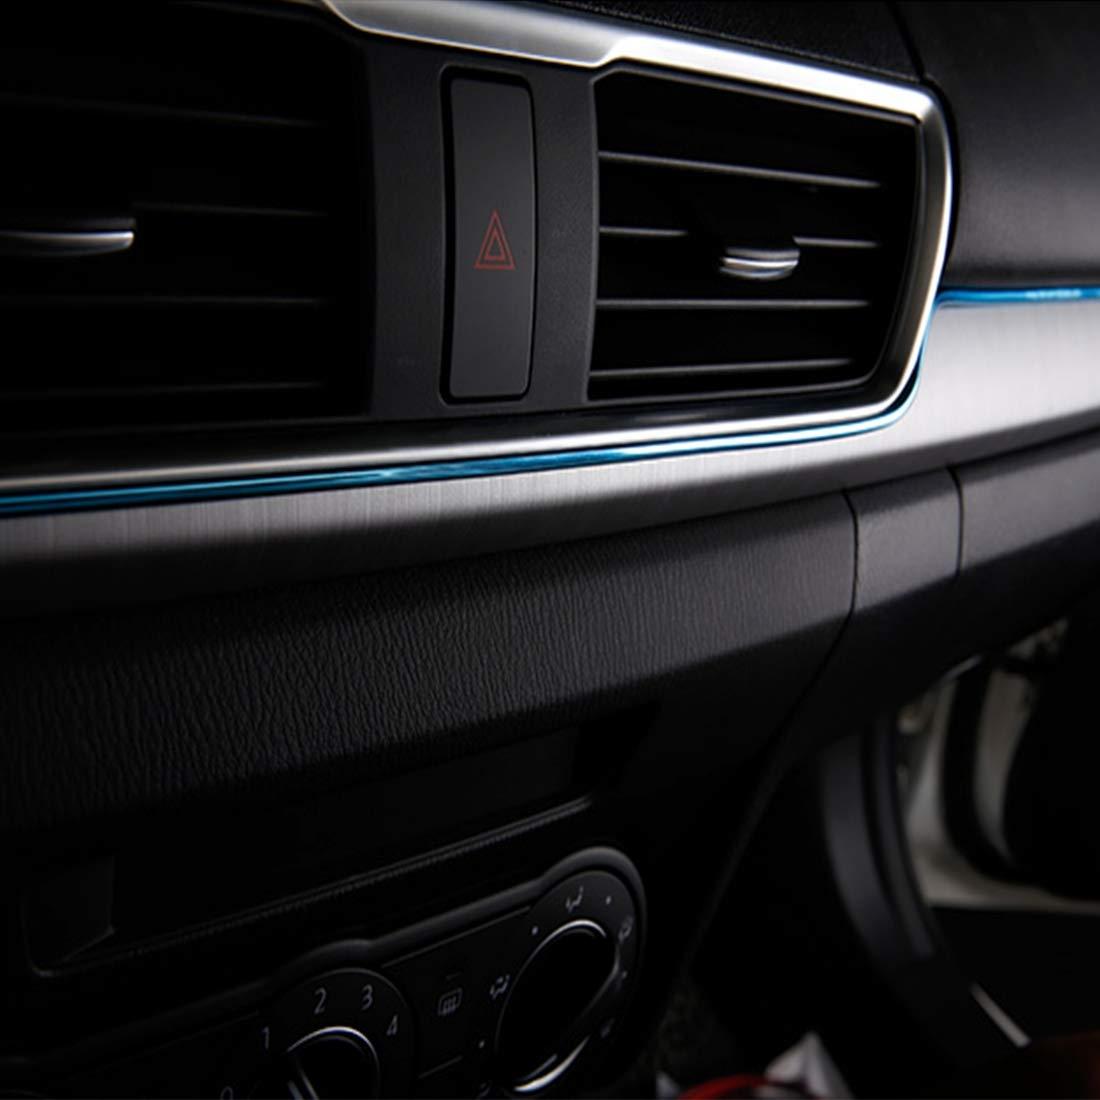 Orange QGT 5m Flexible Trim For DIY Automobile Car Interior Moulding Trim Decorative Line Strip with Film Scraper Color : Blue